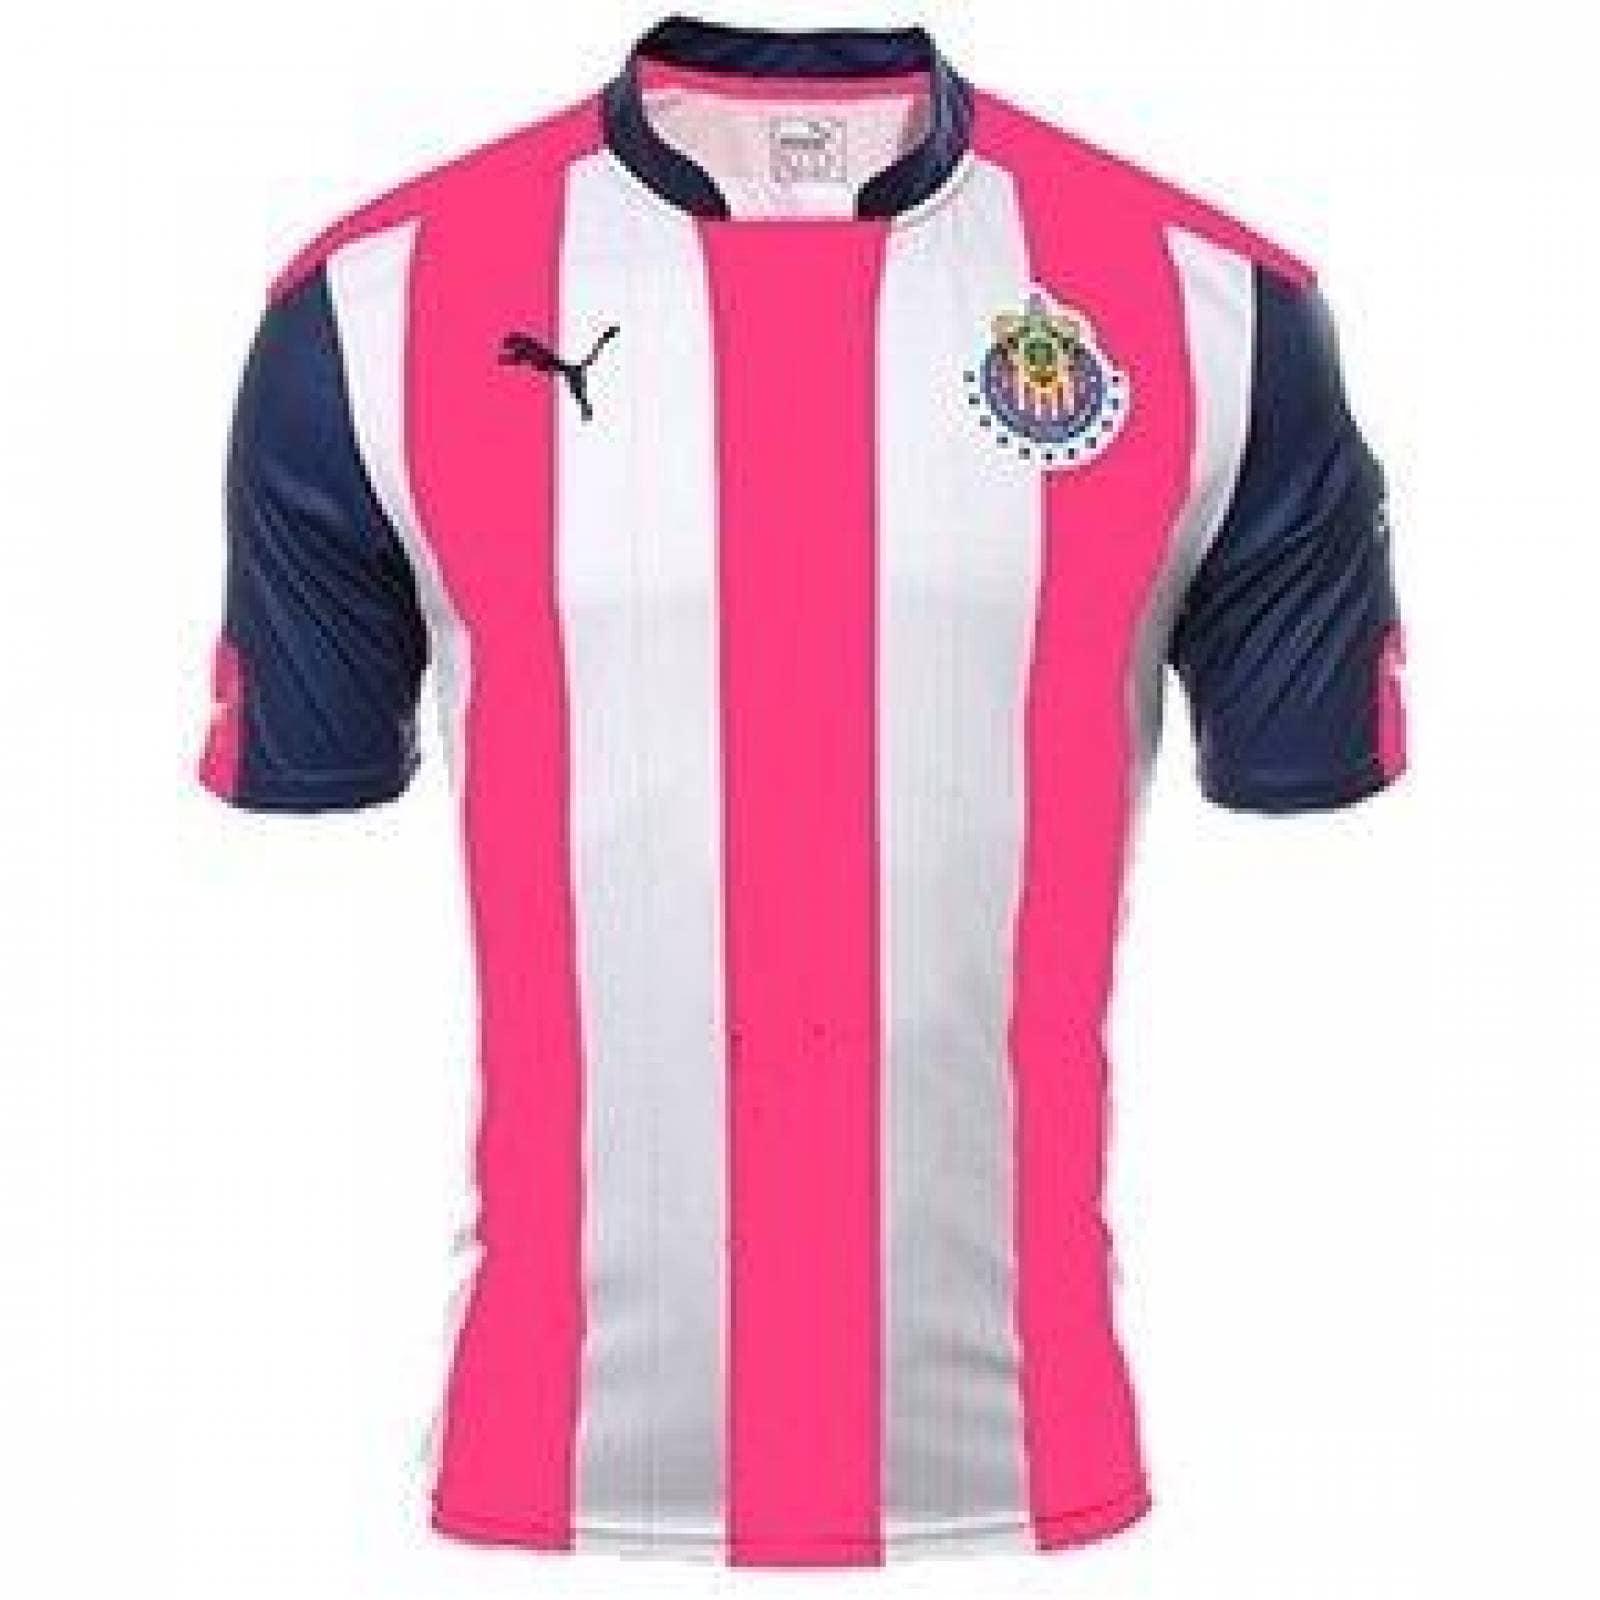 new arrivals 0dc8d 73561 Jersey chivas pink 17/18 - hombre - adulto